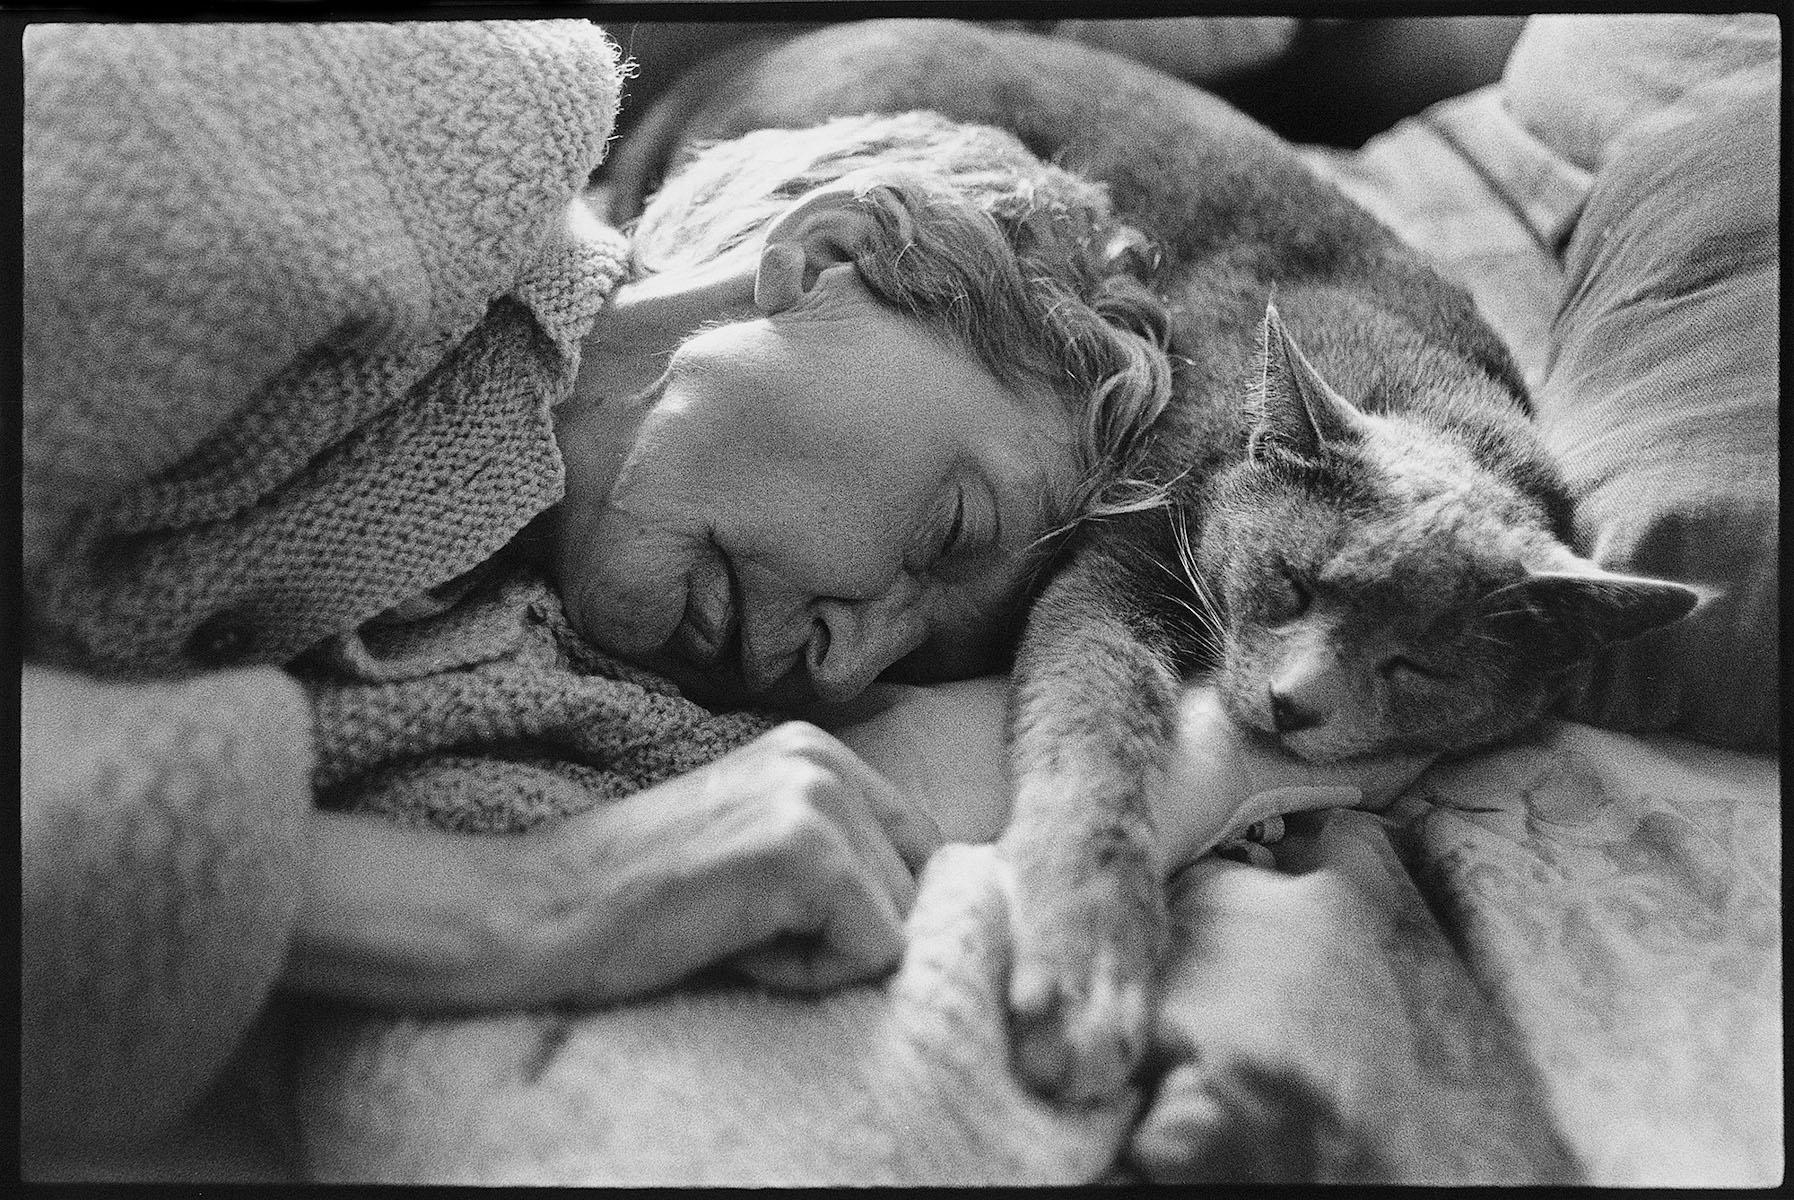 Grandmother sleeping with my cat.